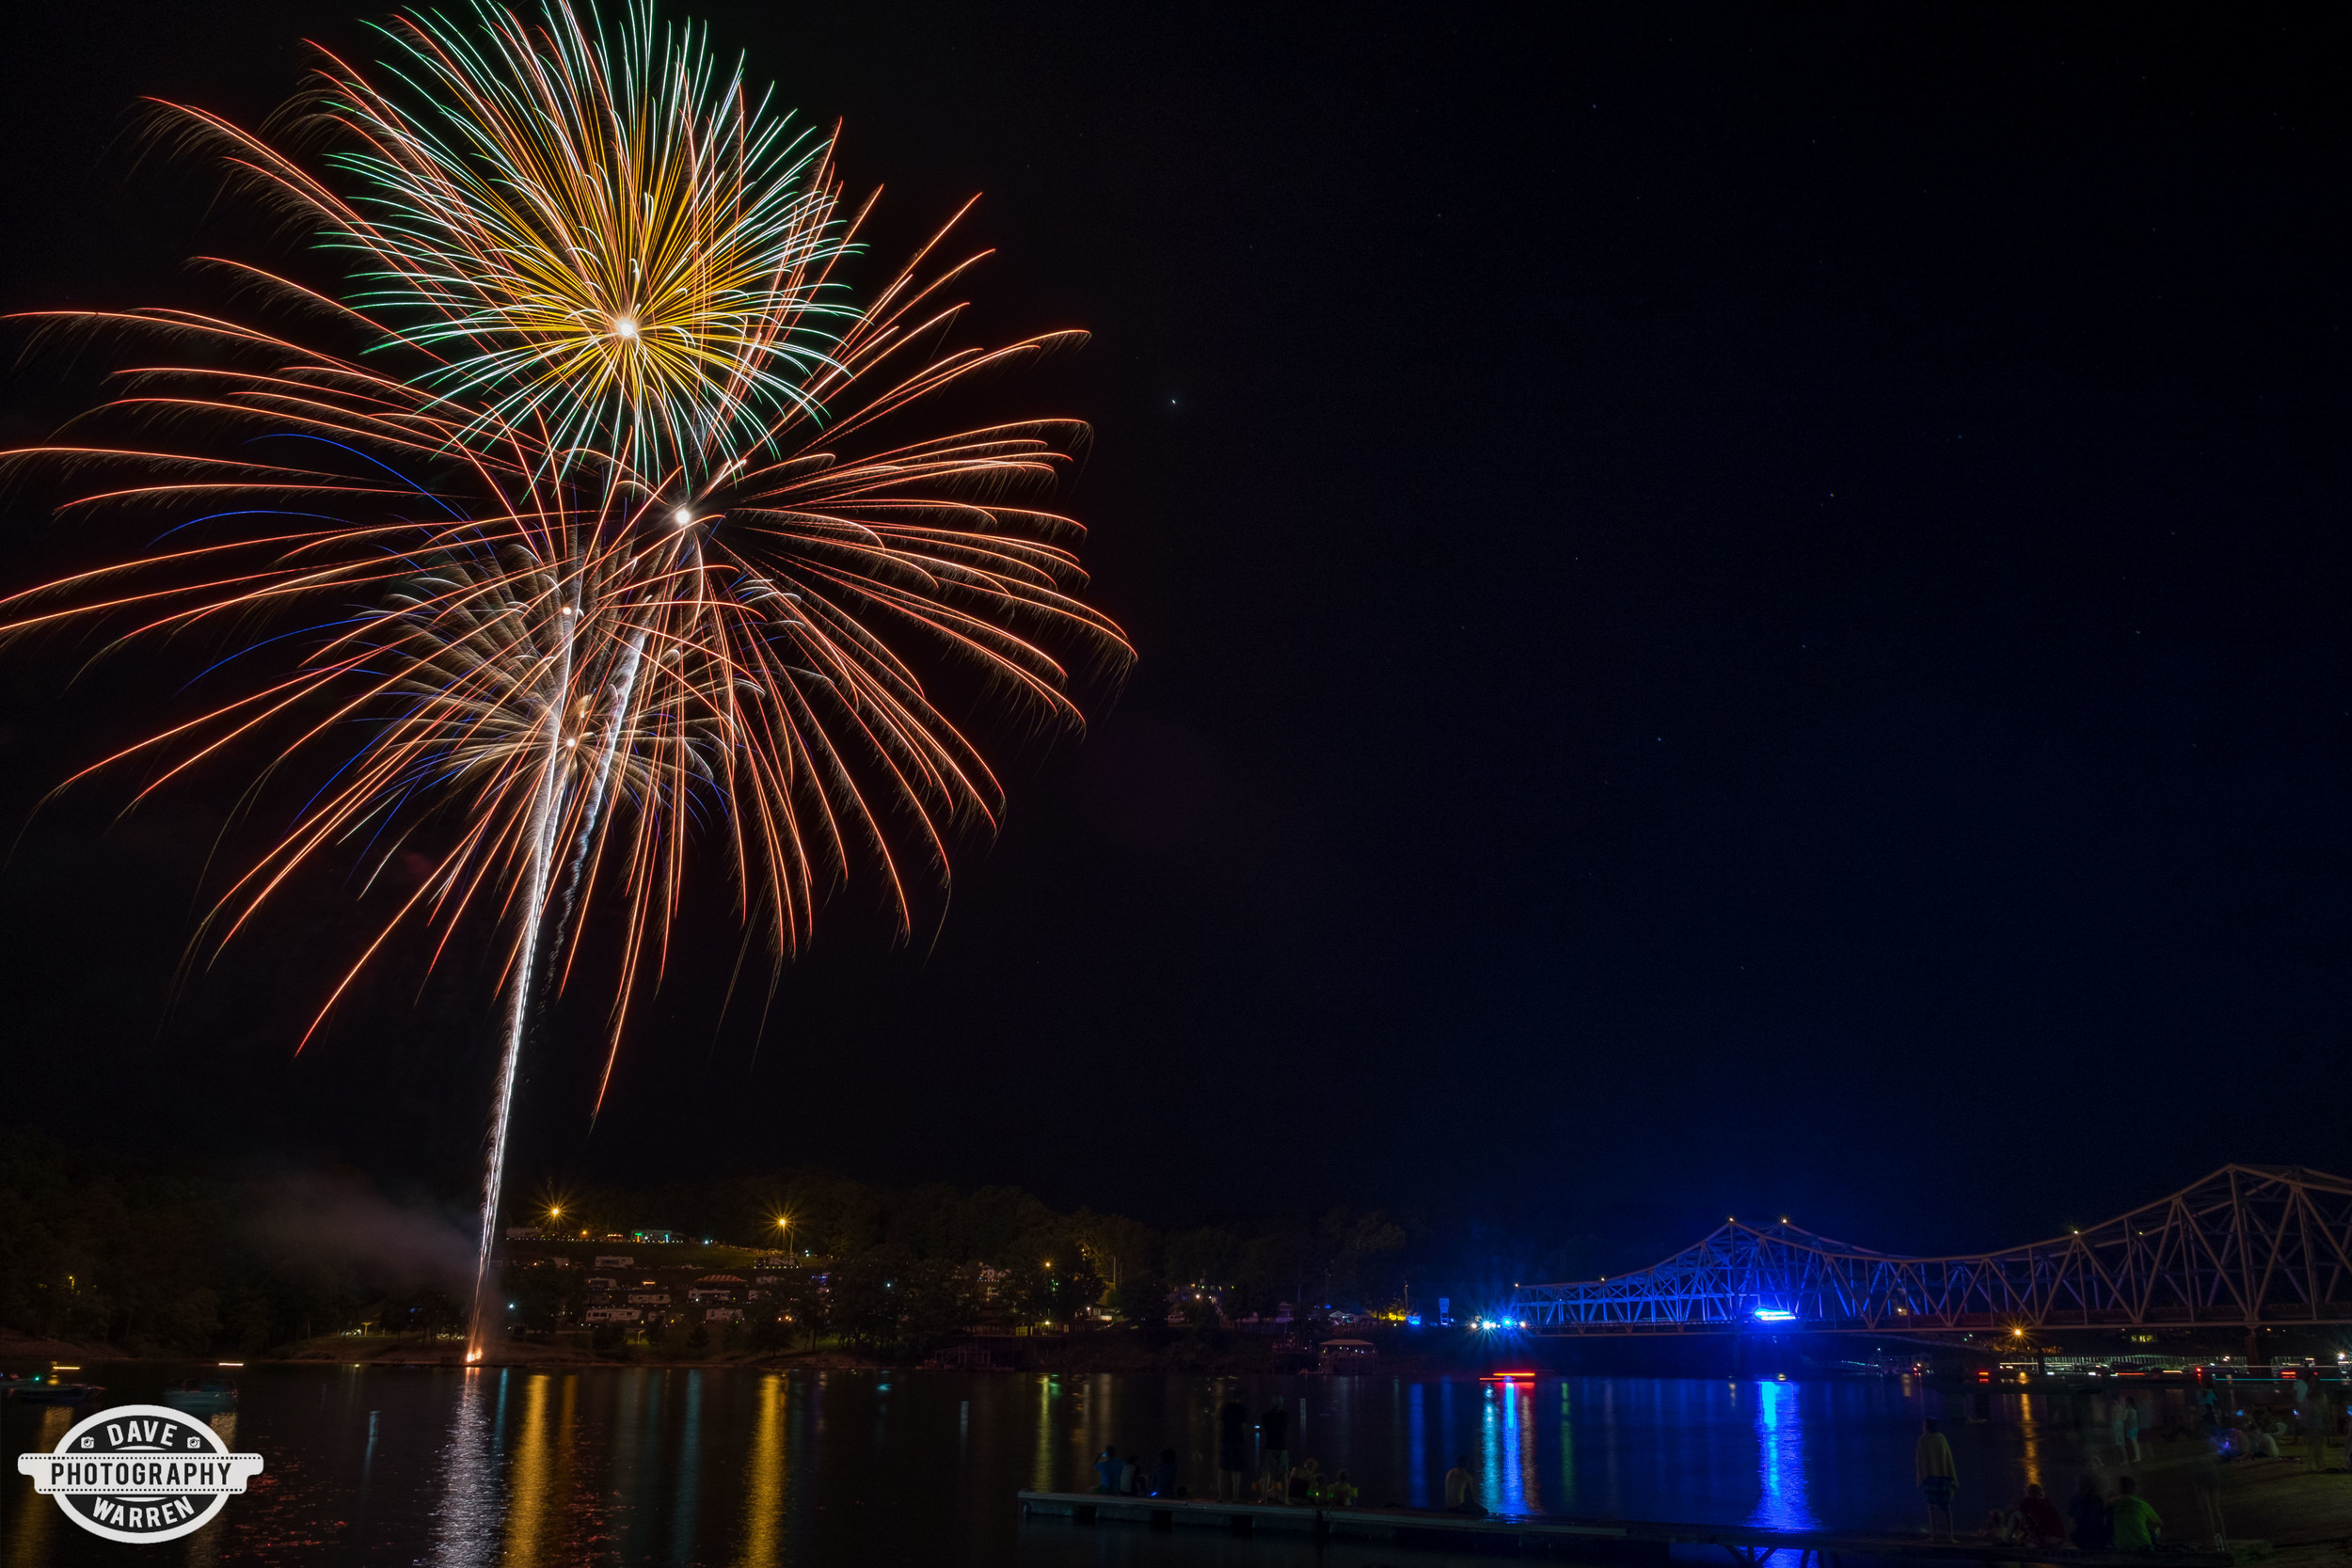 Fireworks at Duncan Bridge